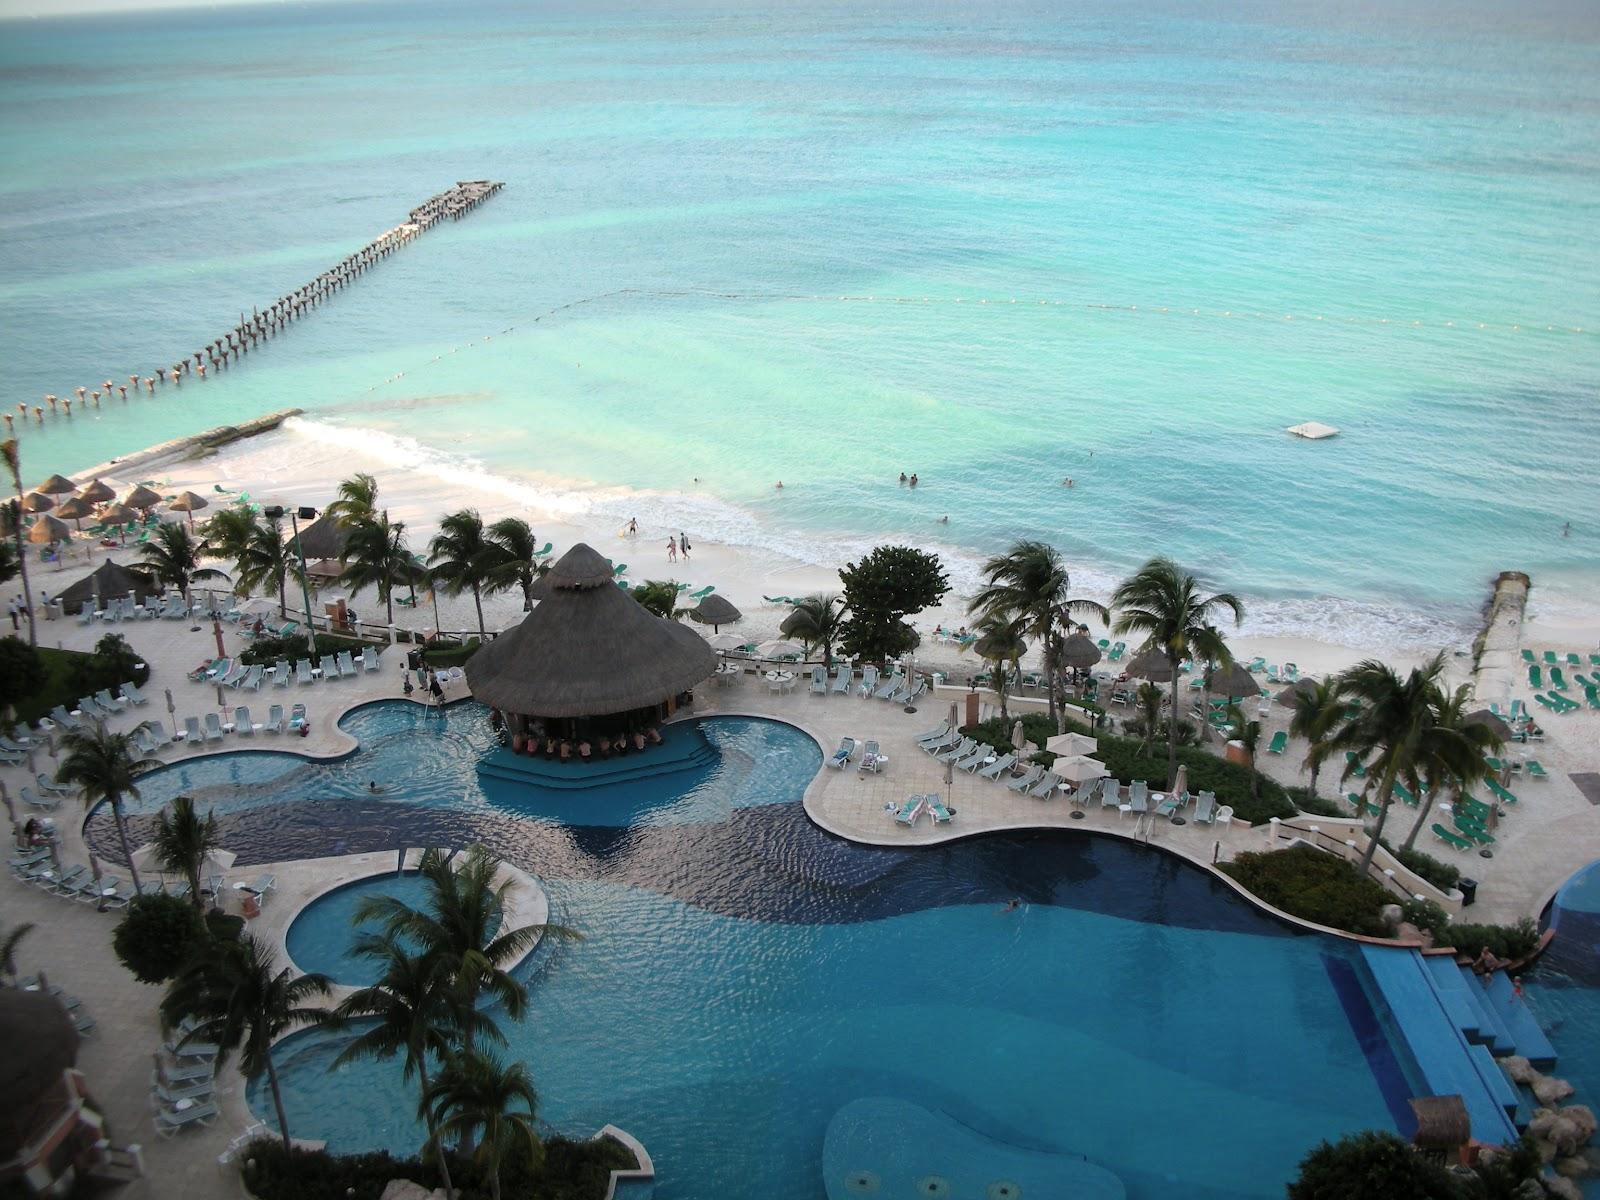 Wallpaper Hd De Cancun: World Most Popular Places: Cancun Beach Mexico Walpapers